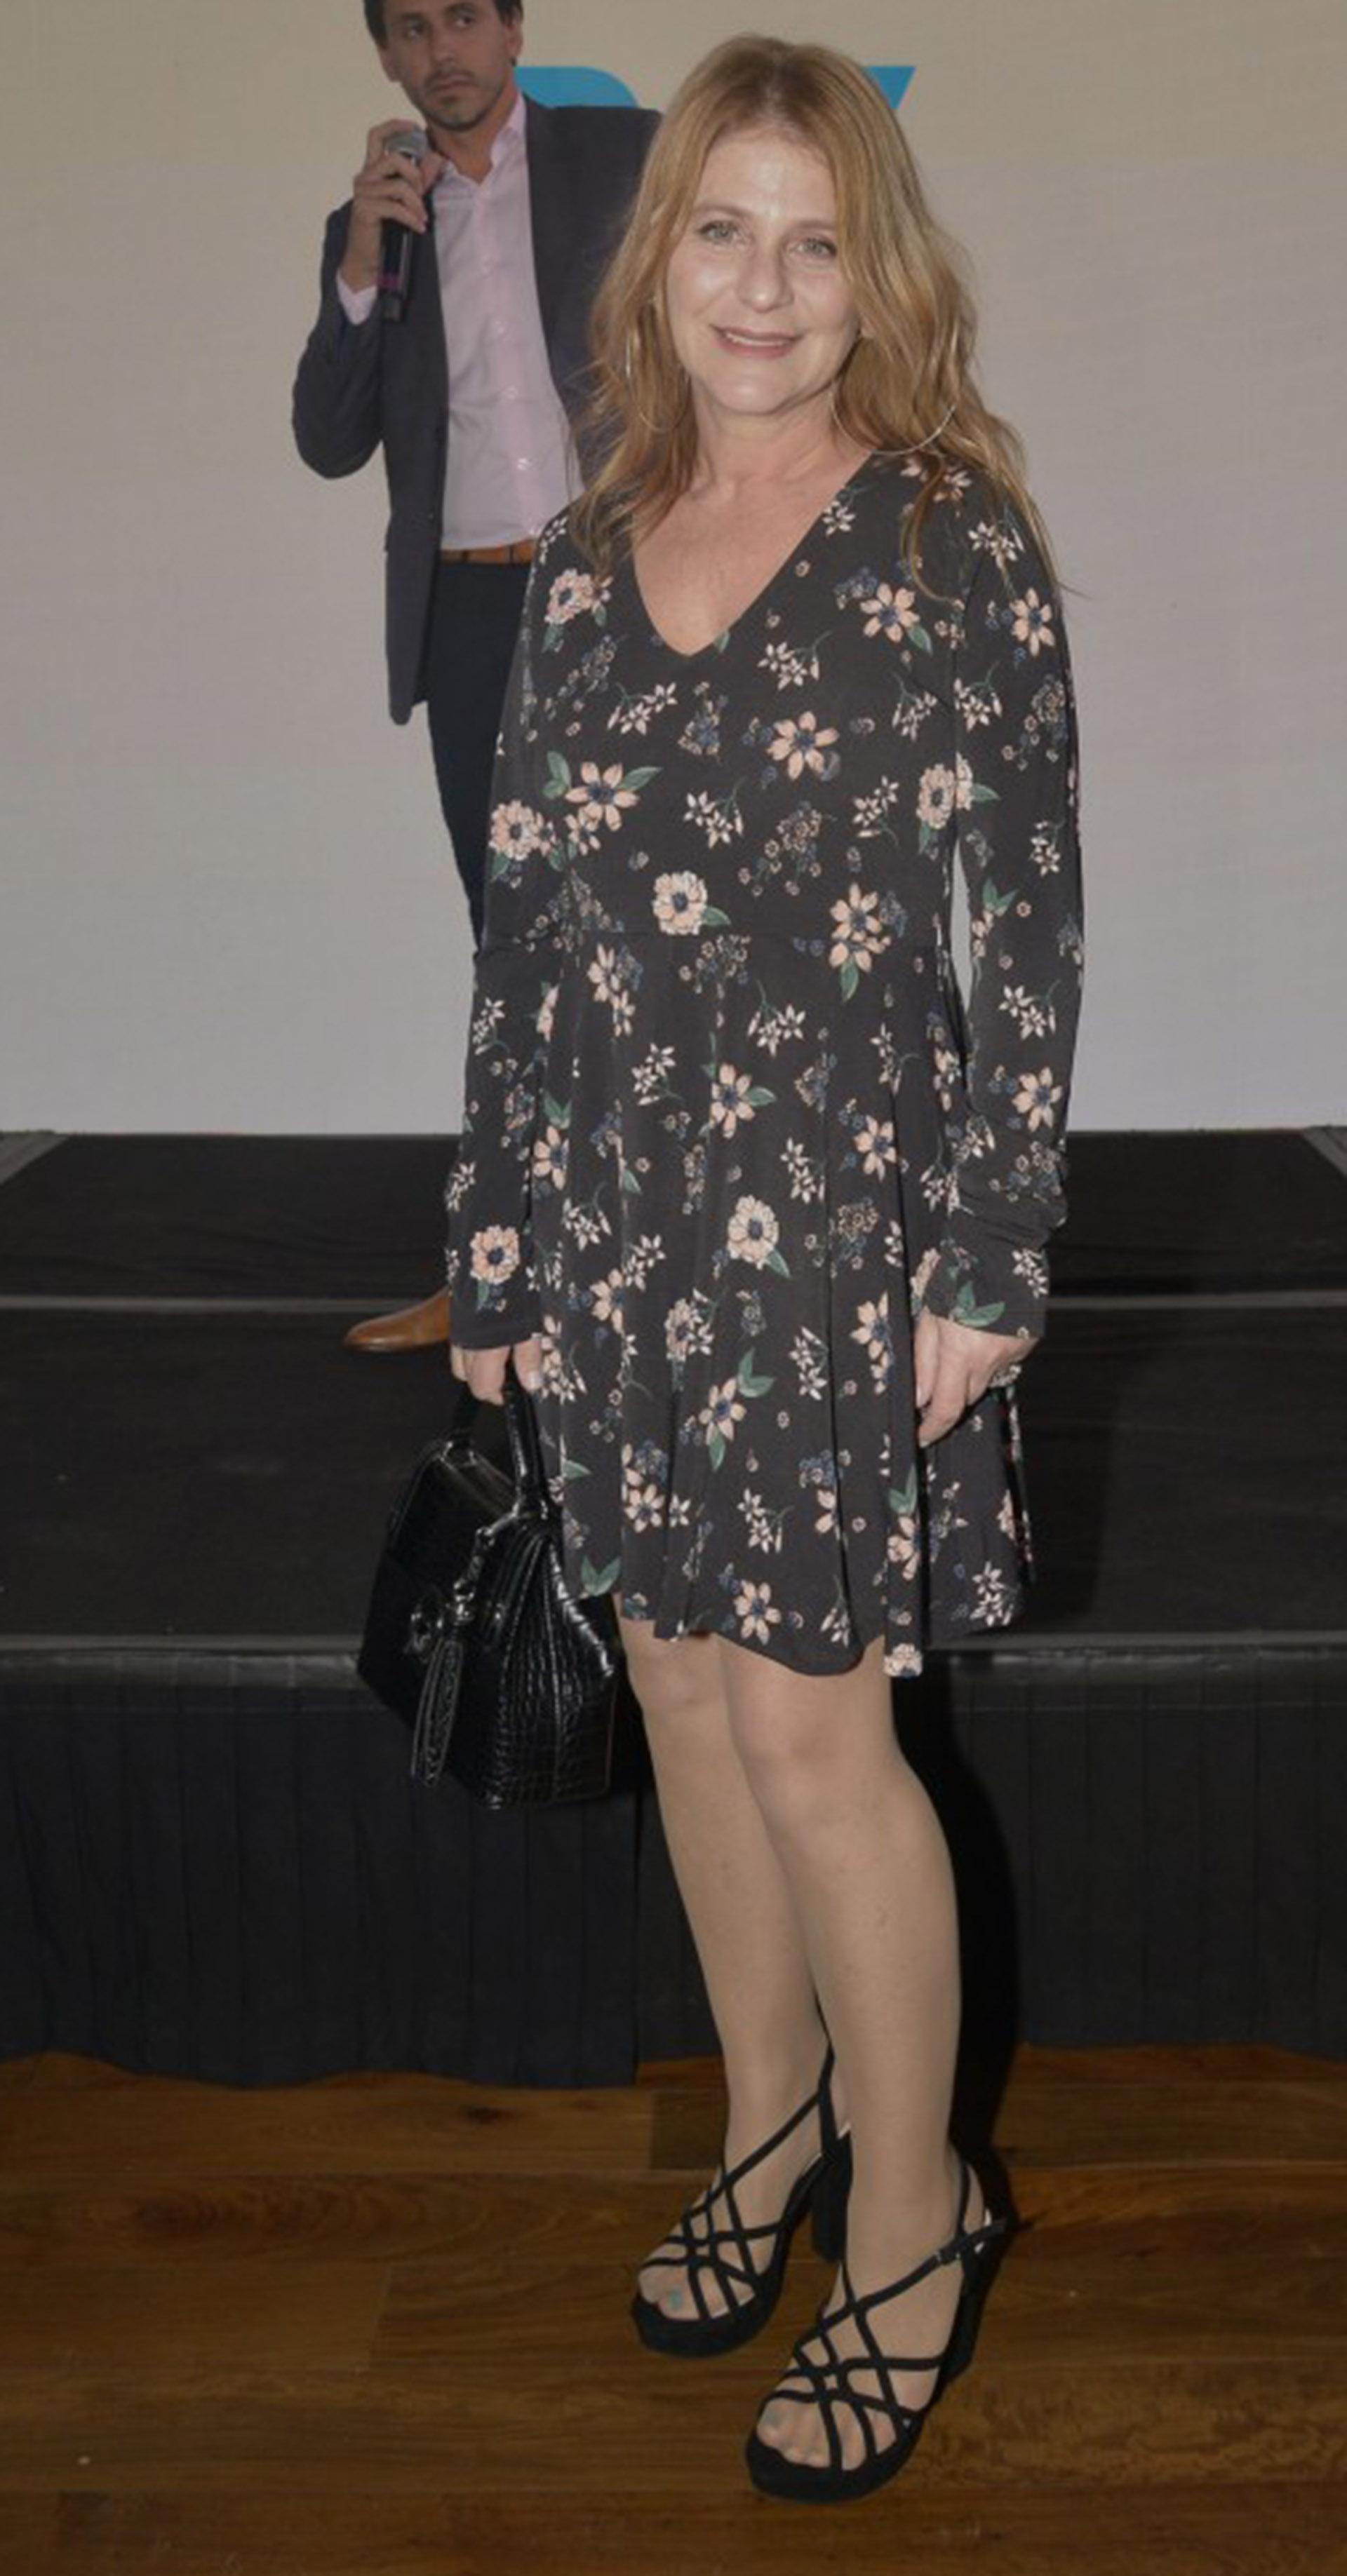 Emilia Mazer